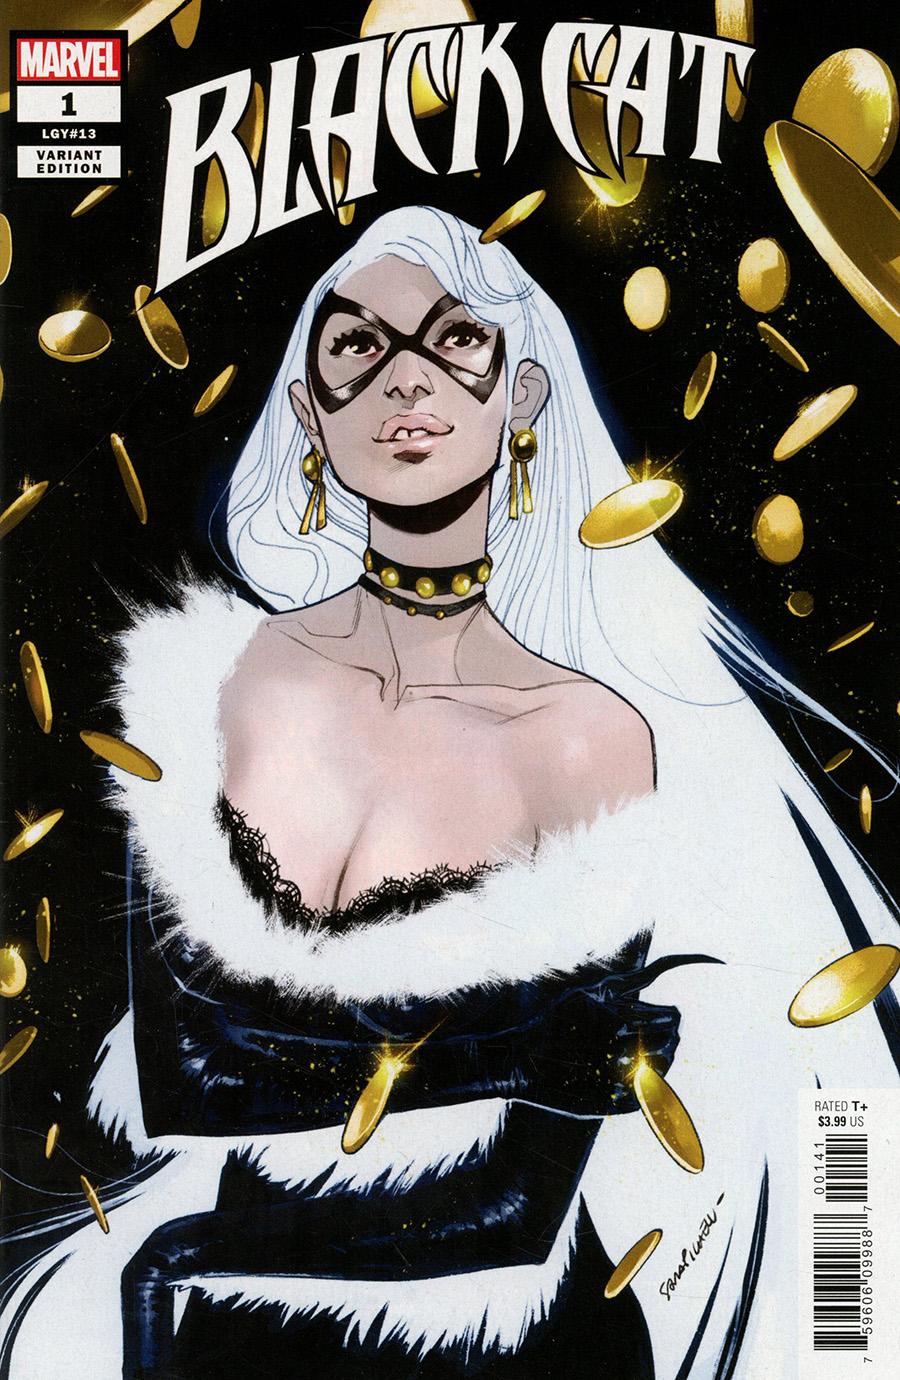 Black Cat Vol 2 #1 Cover F Incentive Sara Pichelli Variant Cover (King In Black Tie-In)